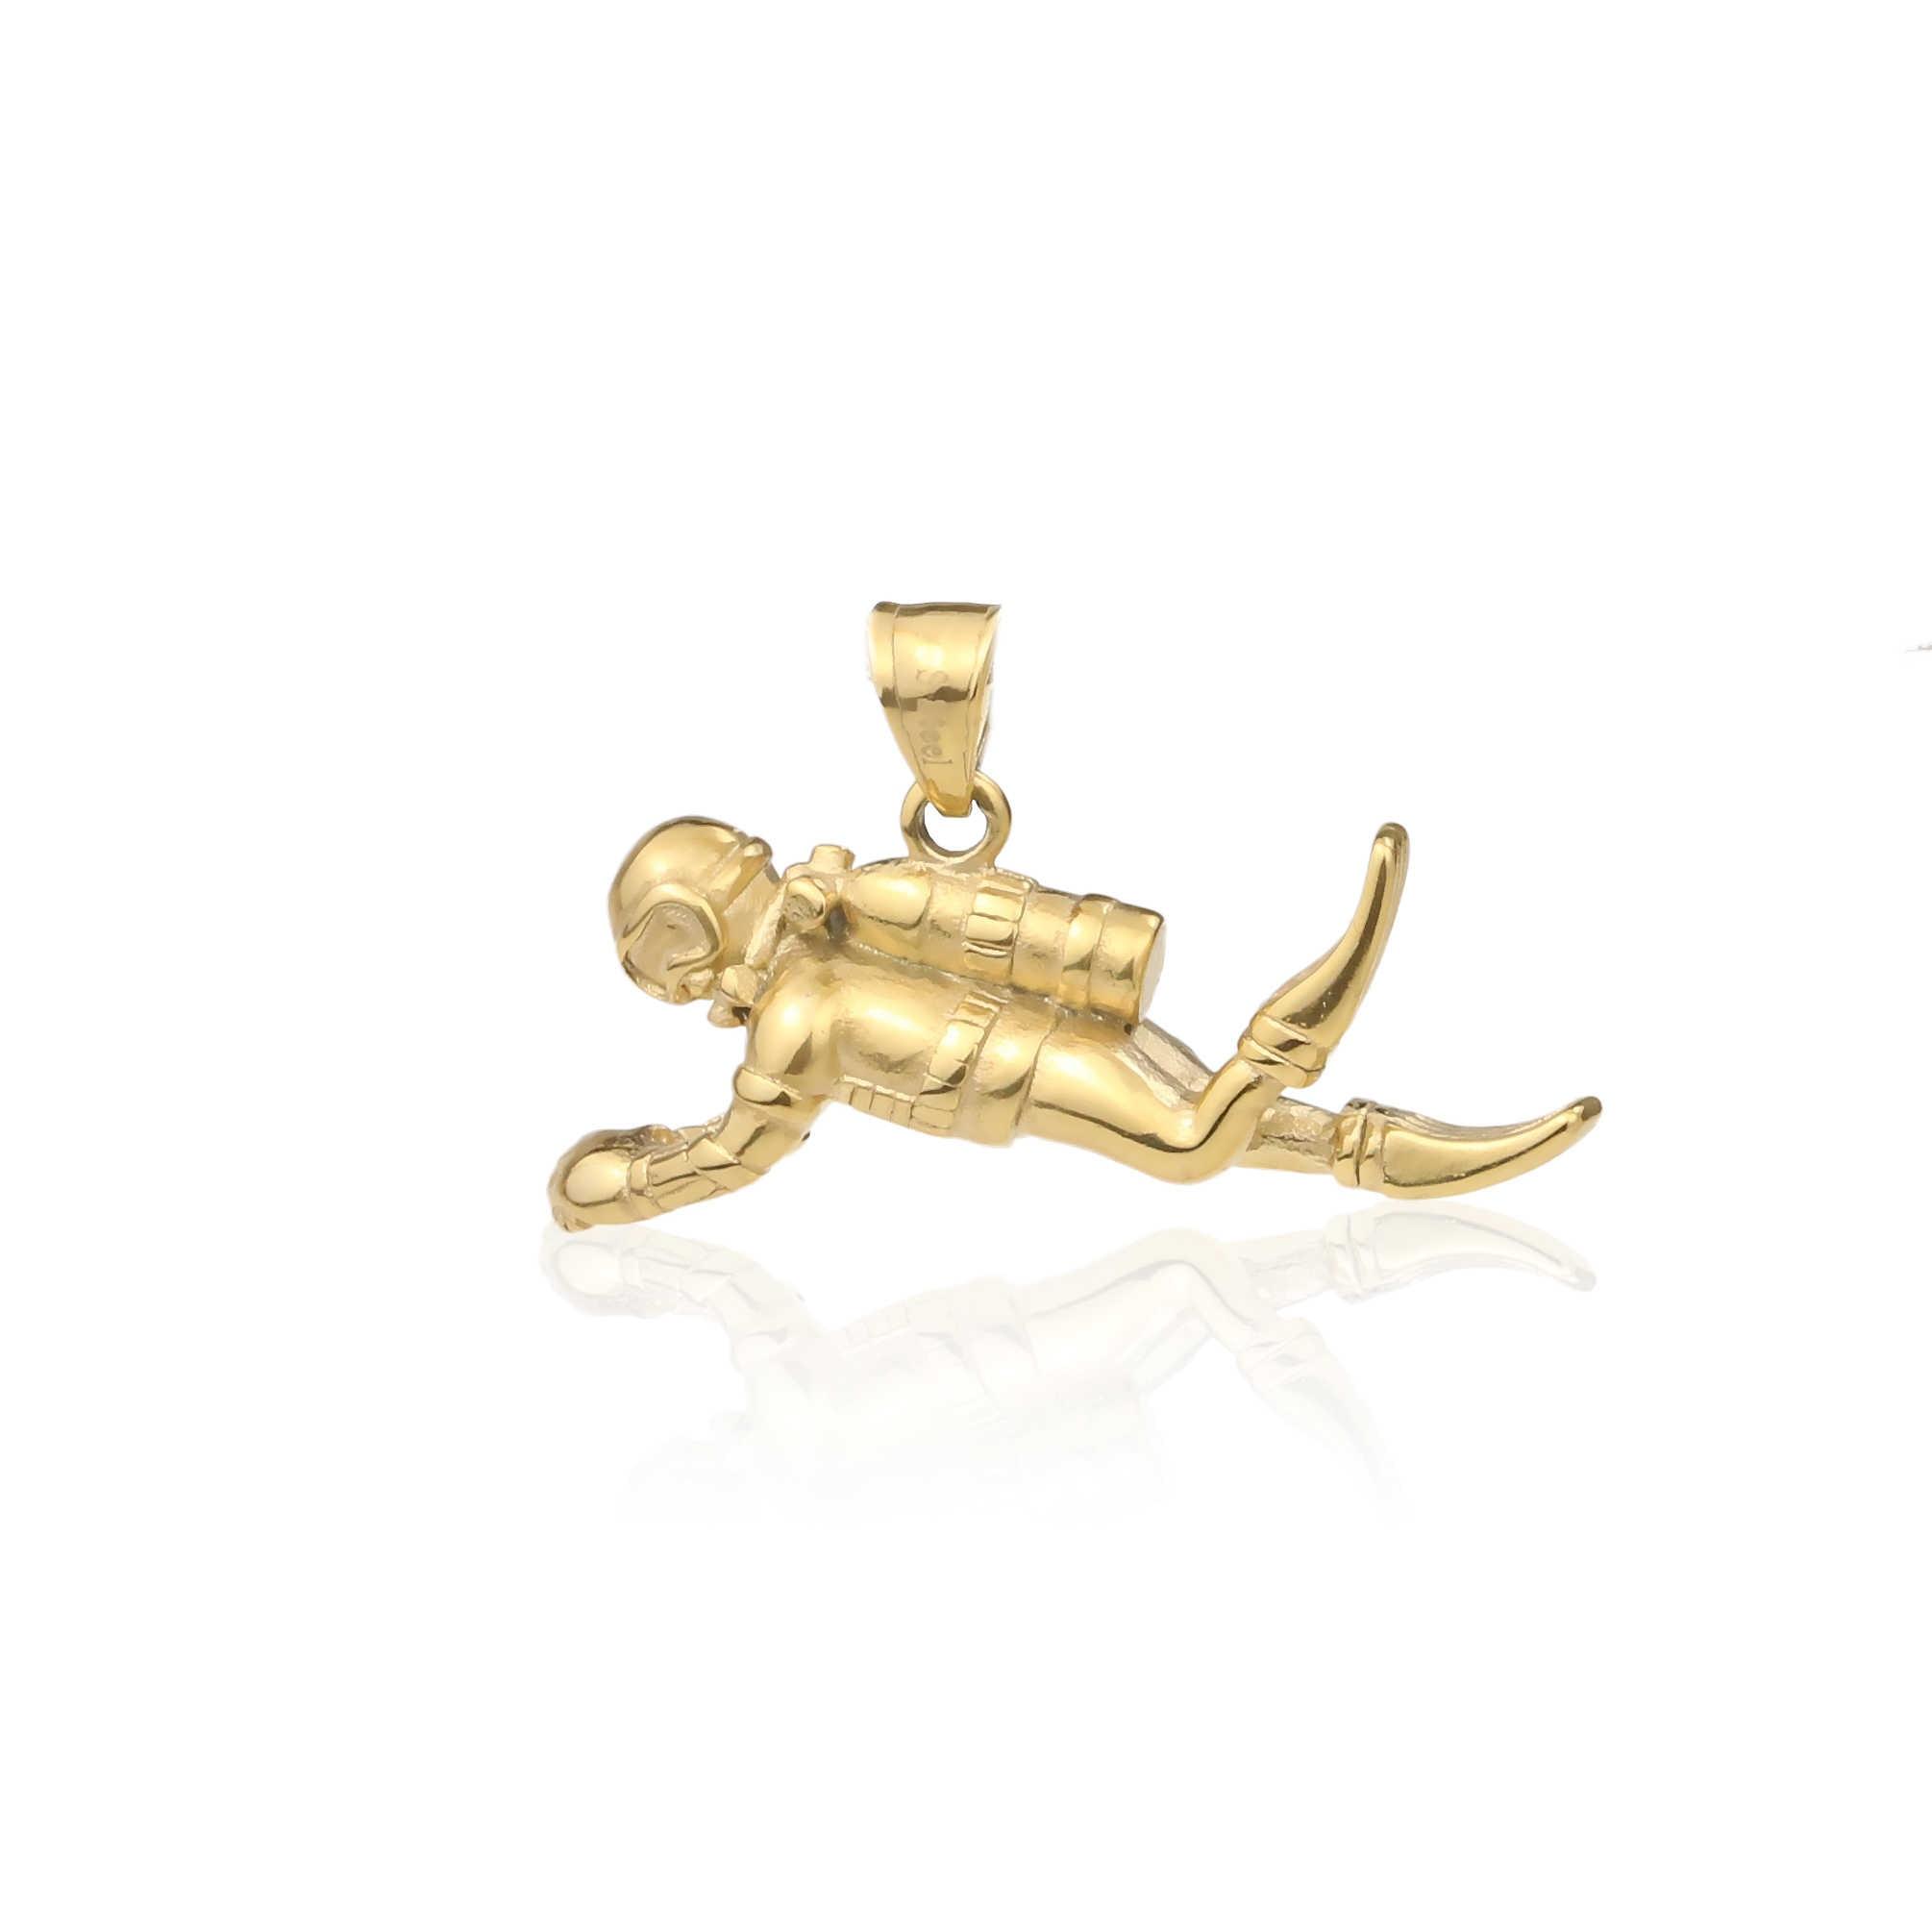 316L Rvs 3D Diver Bedels Hangers Voor Sieraden Maken Retro Tone Charms Armband Diy Waterdichte Ketting Accessoires